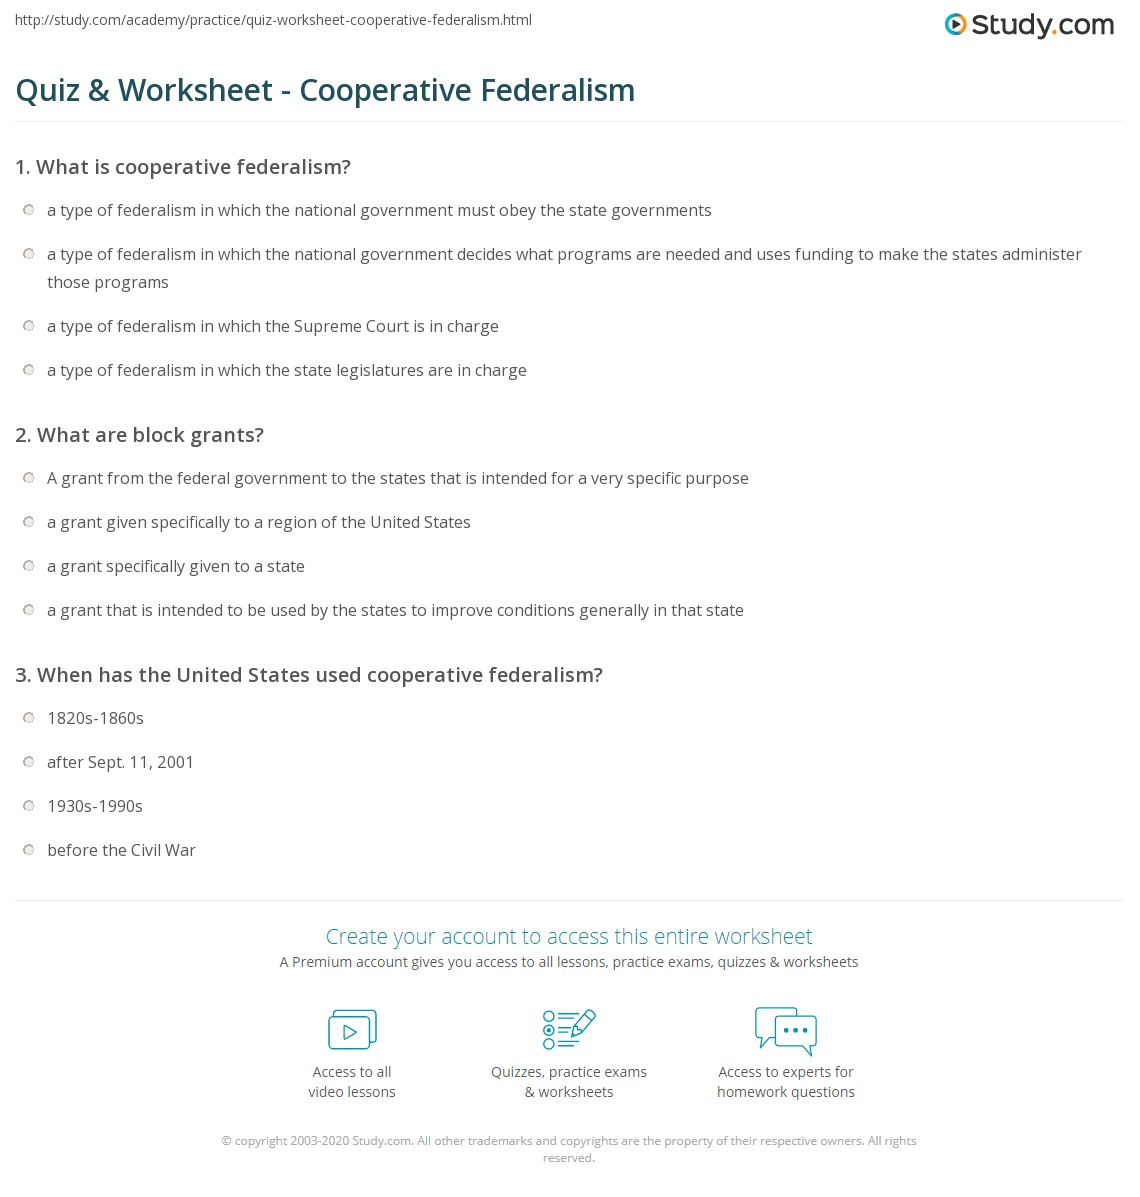 Quiz & Worksheet - Cooperative Federalism | Study.com